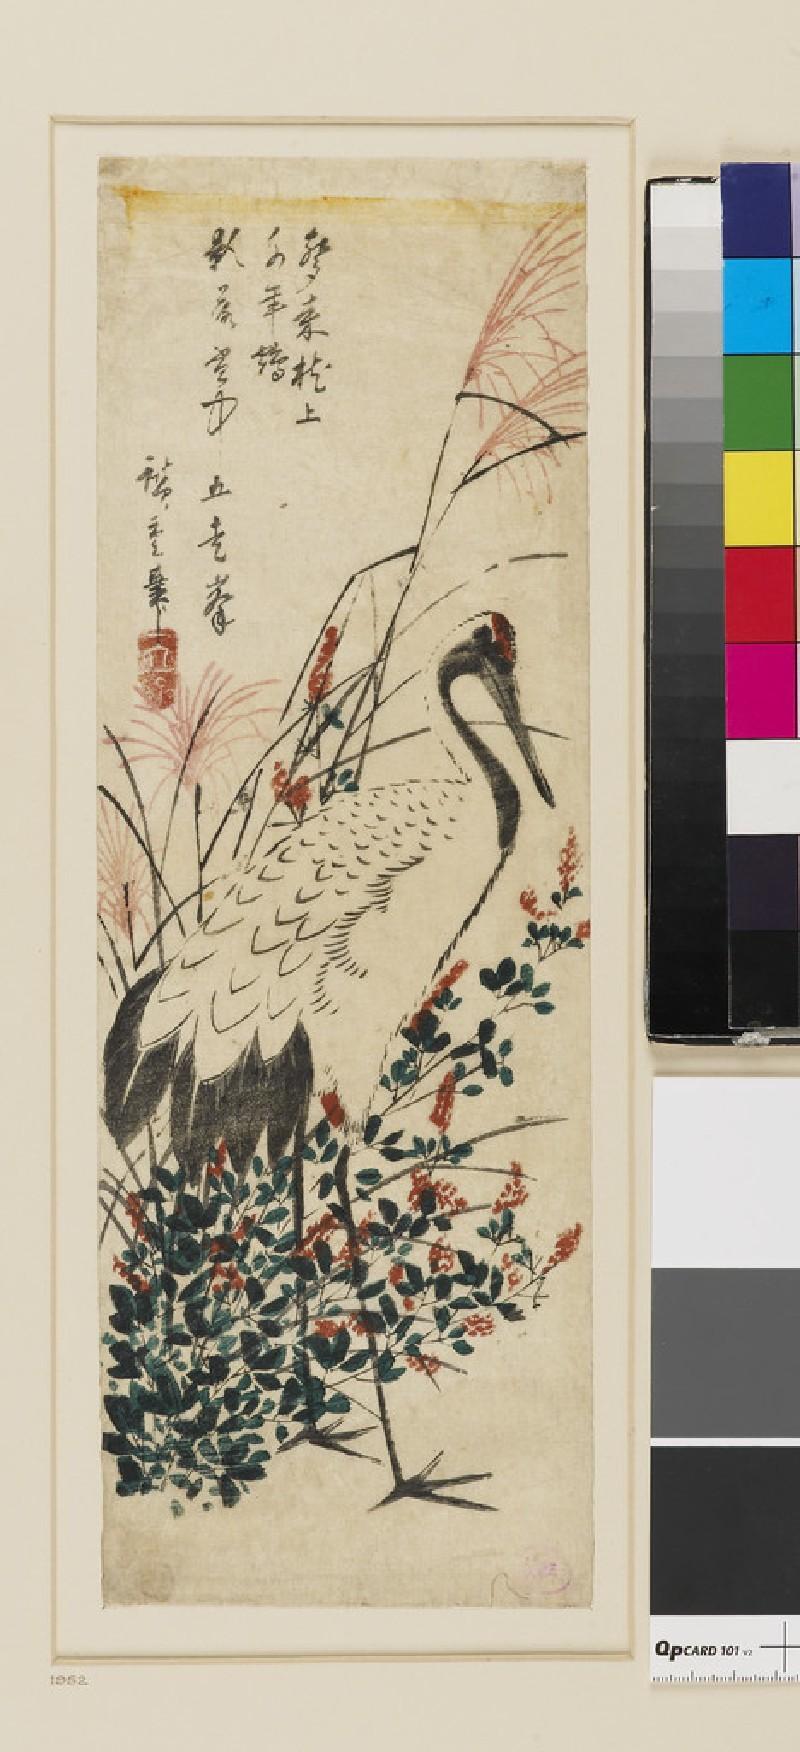 Japanese Pampas Grass, Bush Clover and Red-headed Crane